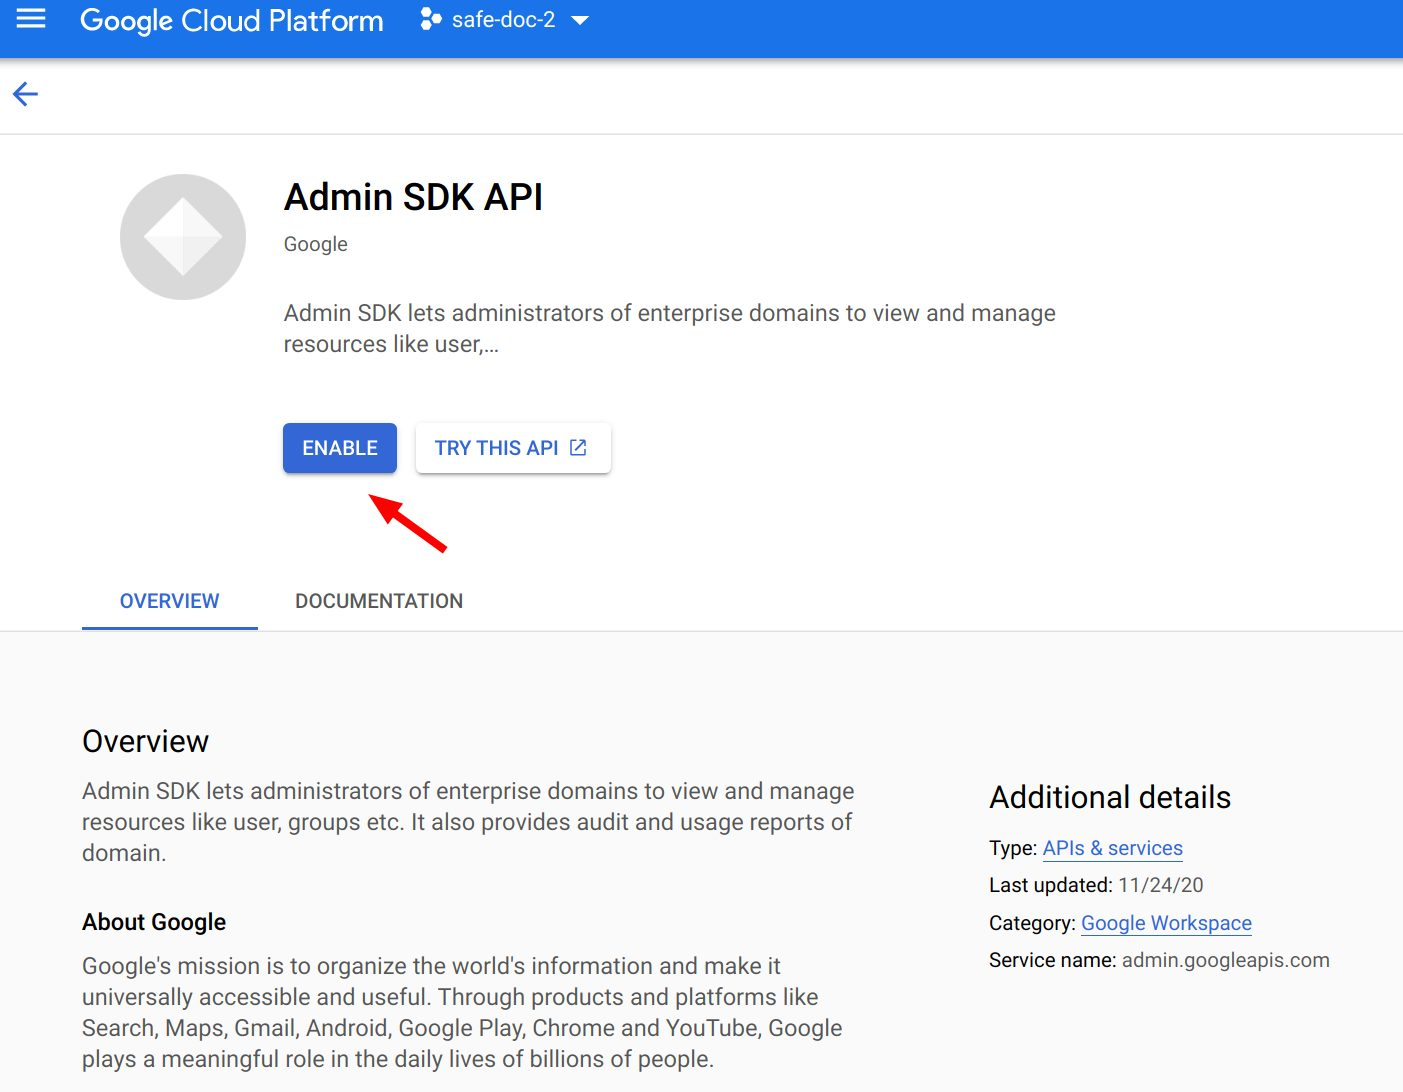 Enable Admin SDK API in GCP